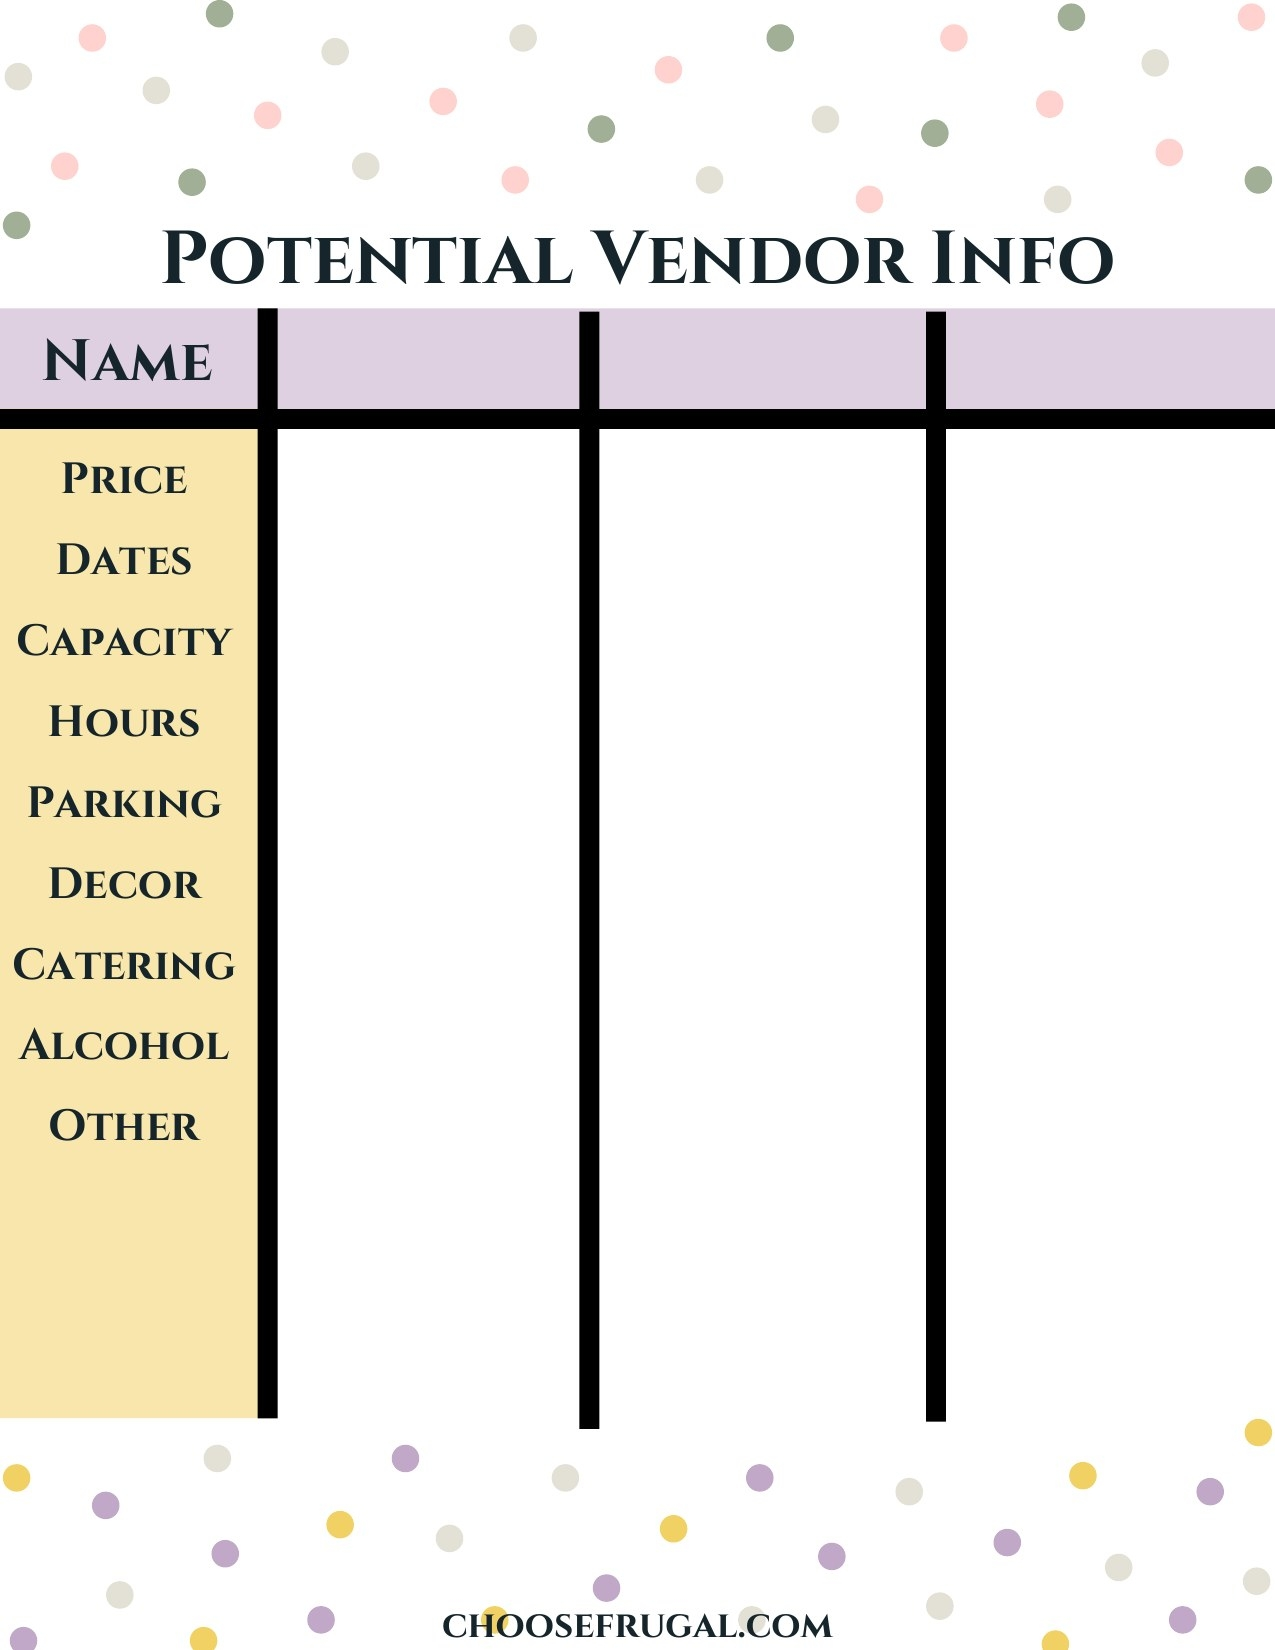 Blank potential vendor template